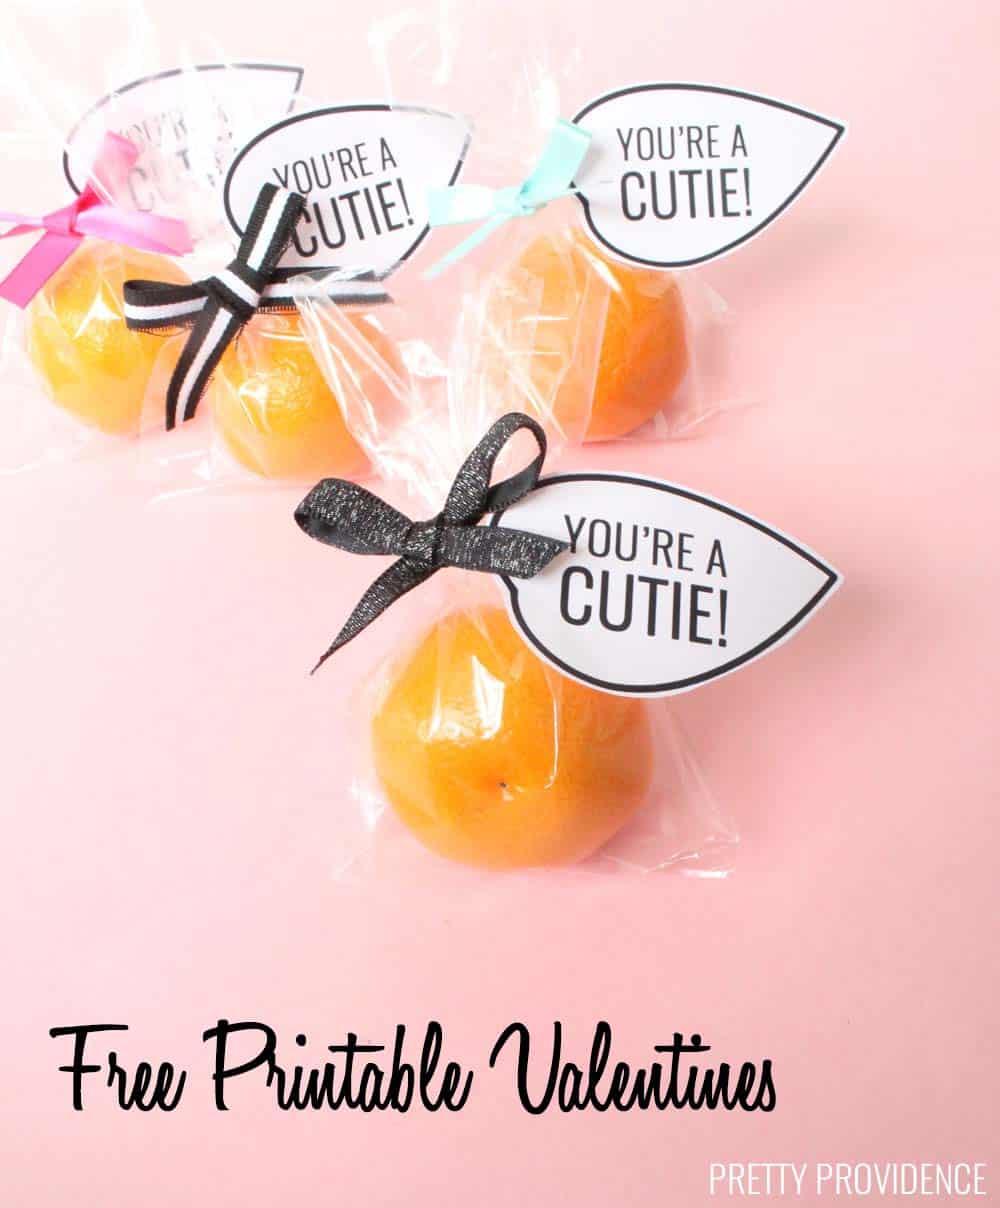 Cutie Oranges Valentine